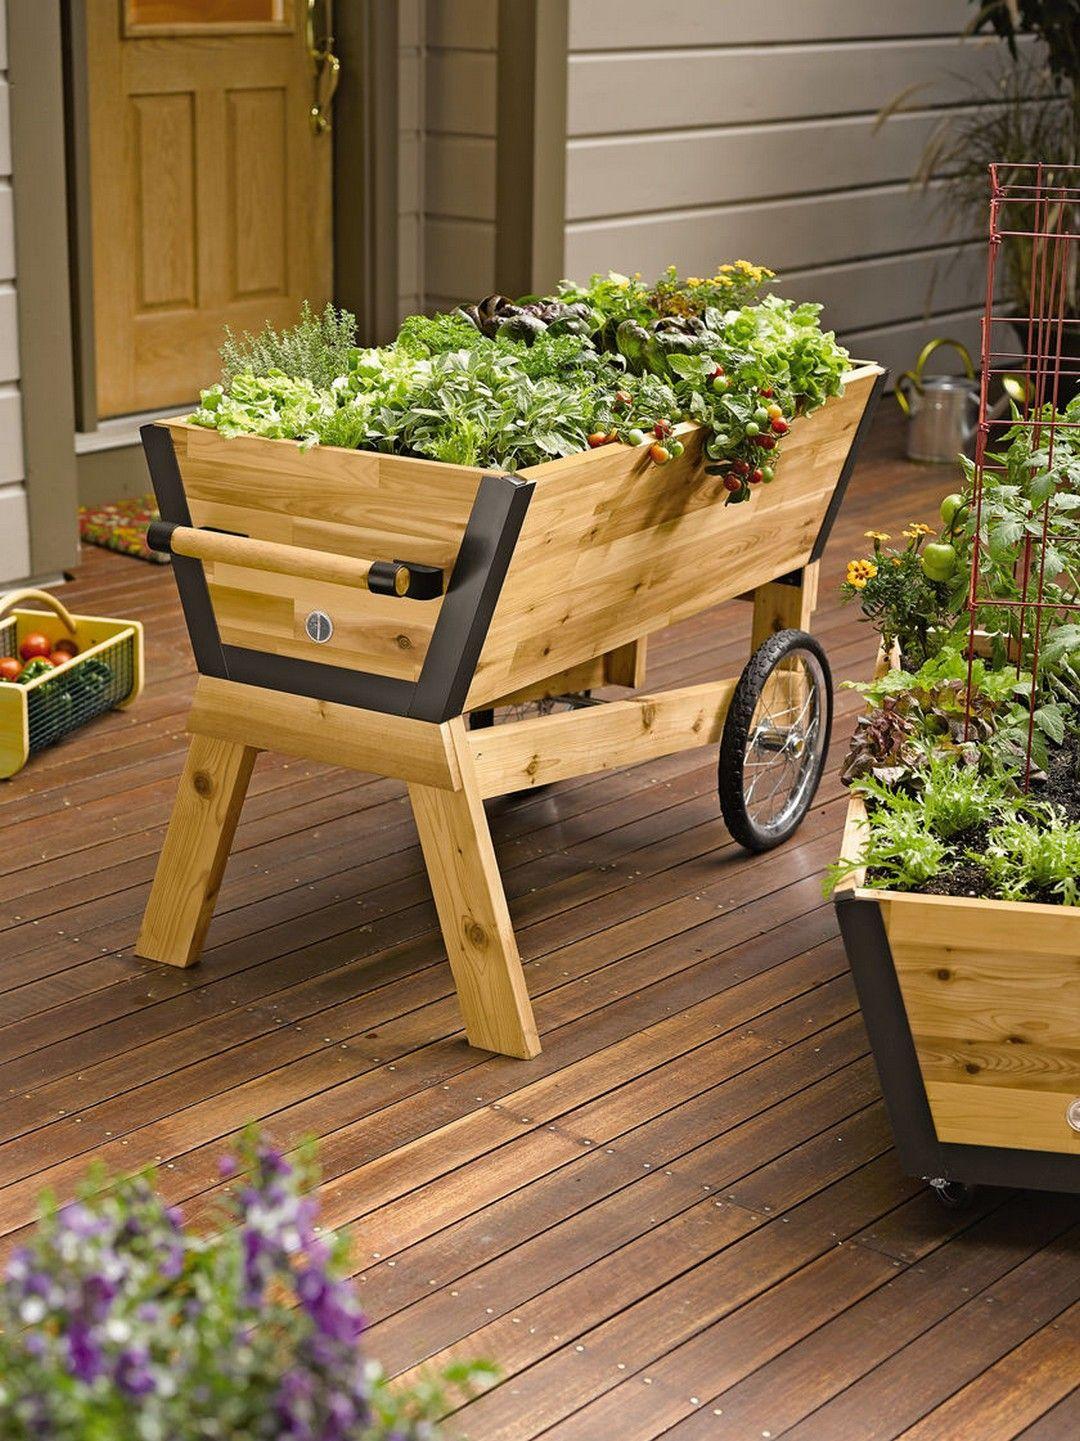 Diy Rustic Wood Planter Box Ideas For Your Amazing Garden 640 x 480